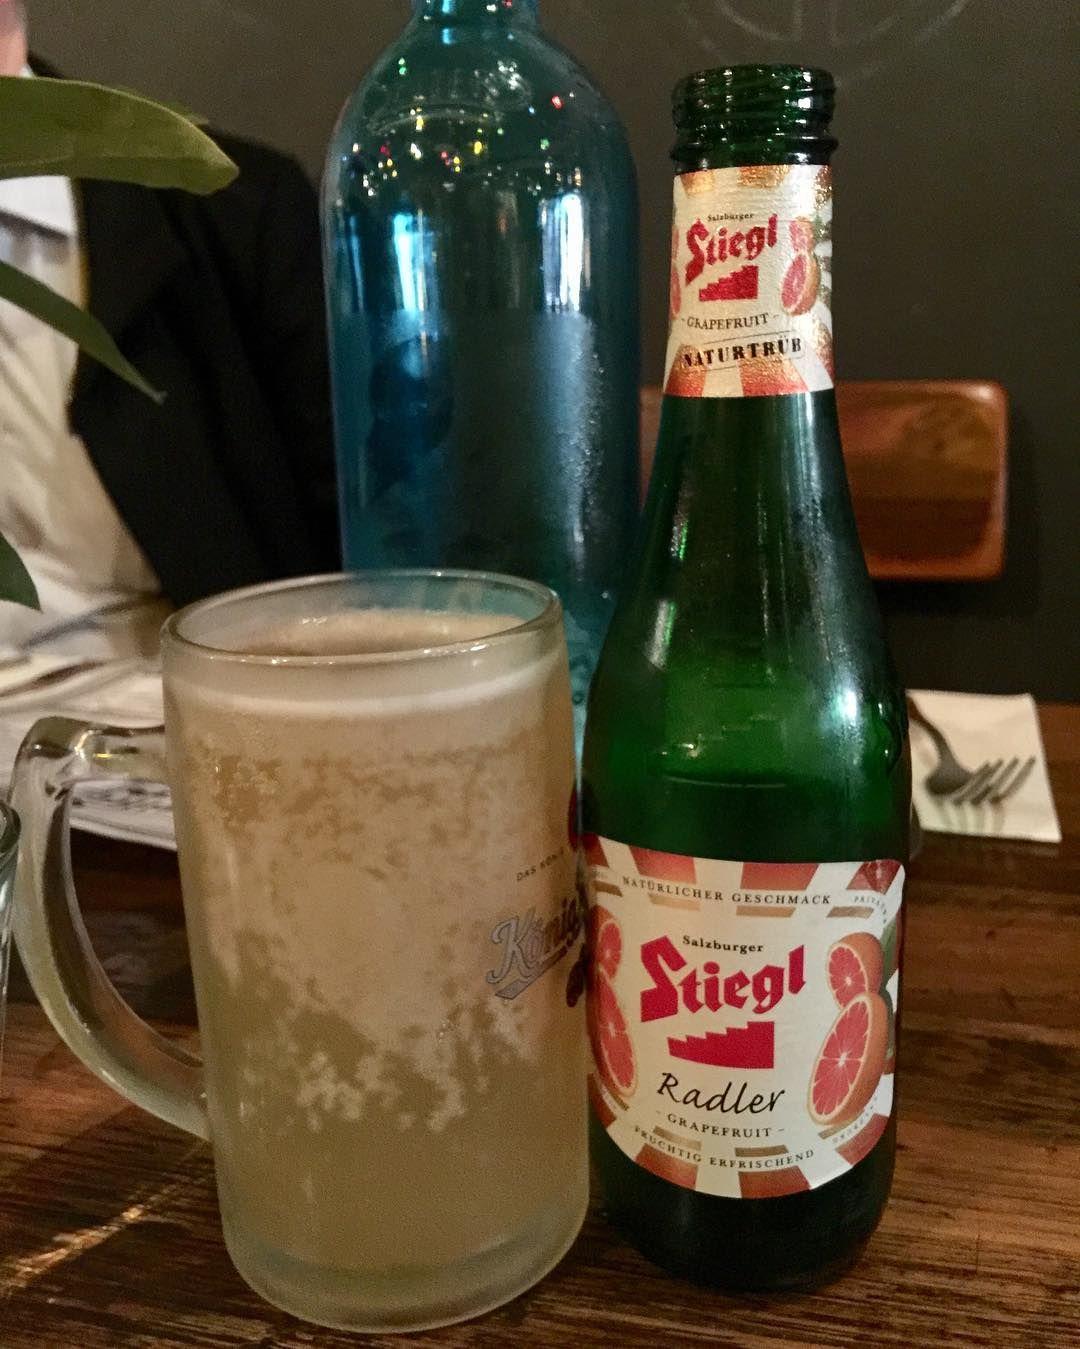 Radler just like on the tour #radler @bierkellerrichmond @bierkeller #bierkeller #austrianfood #stiegl #richmond #stieglradler